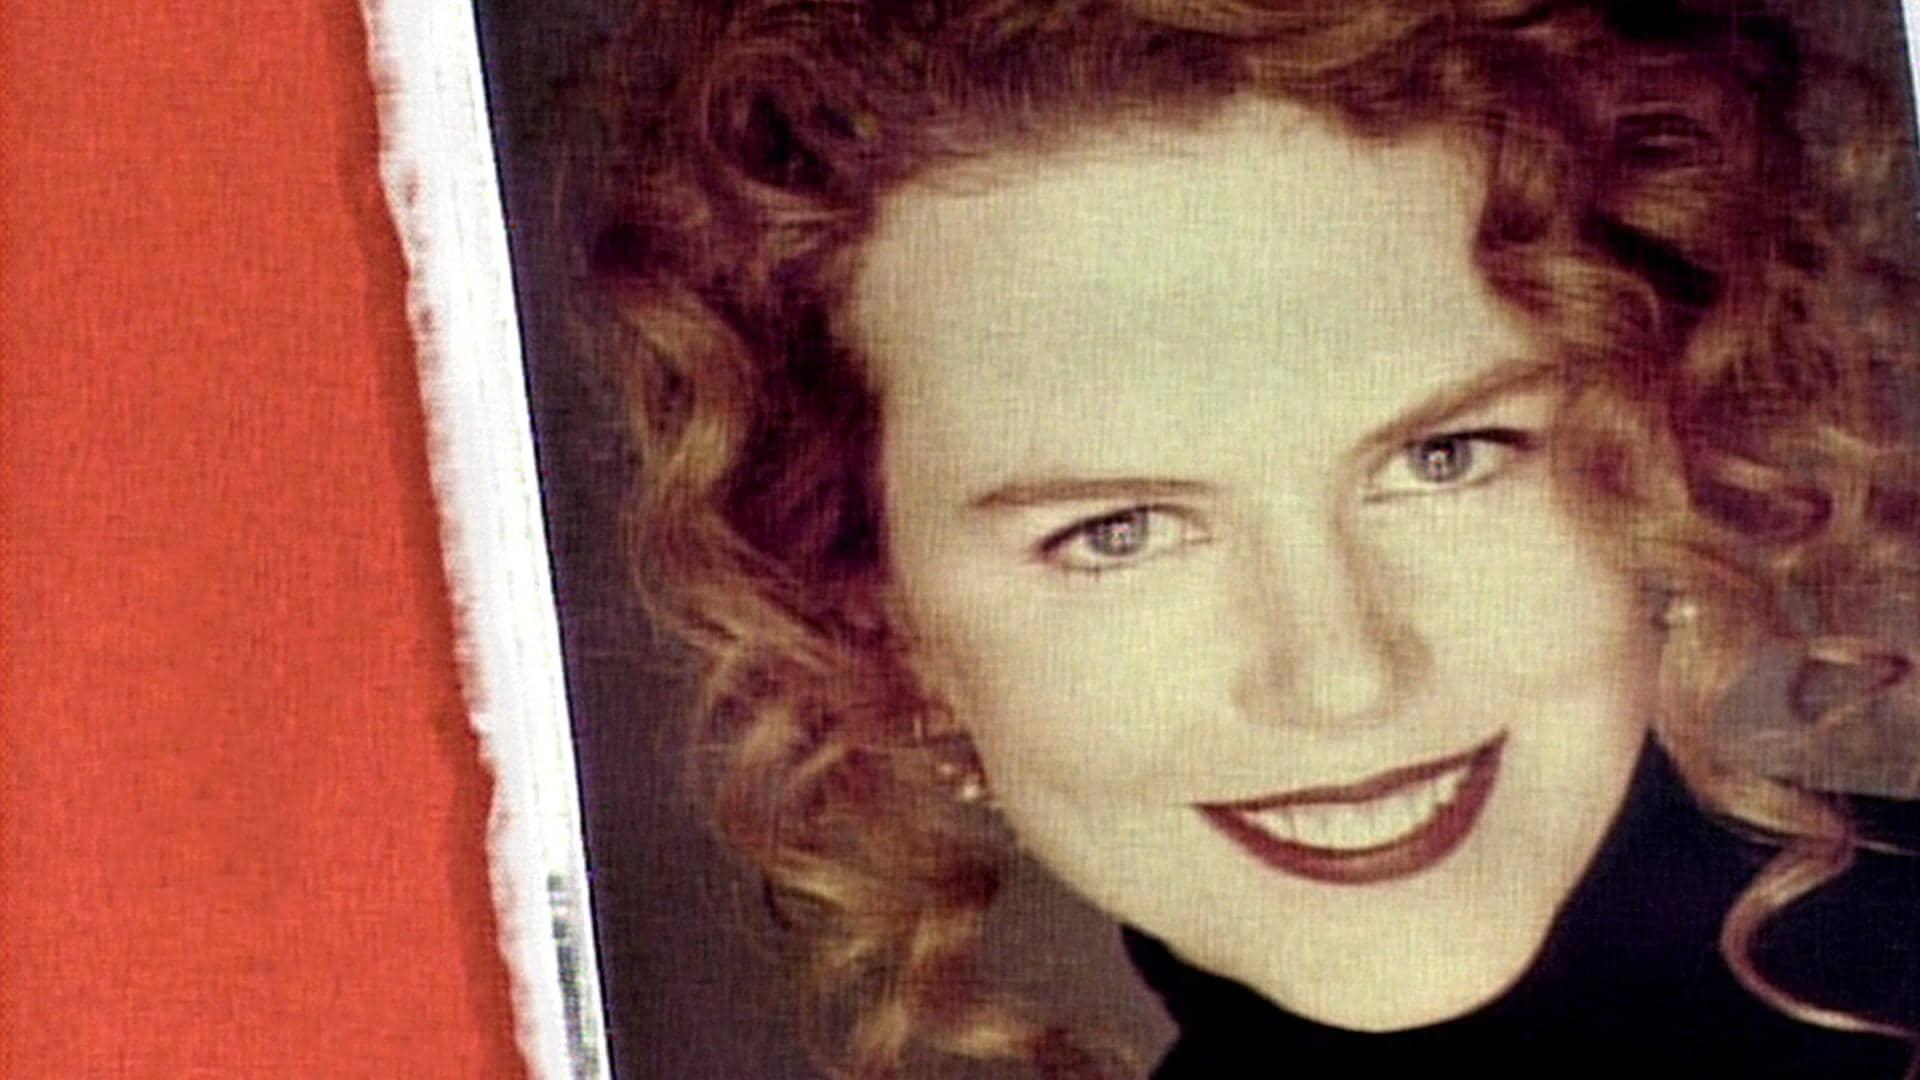 Nicole Kidman: November 20, 1993